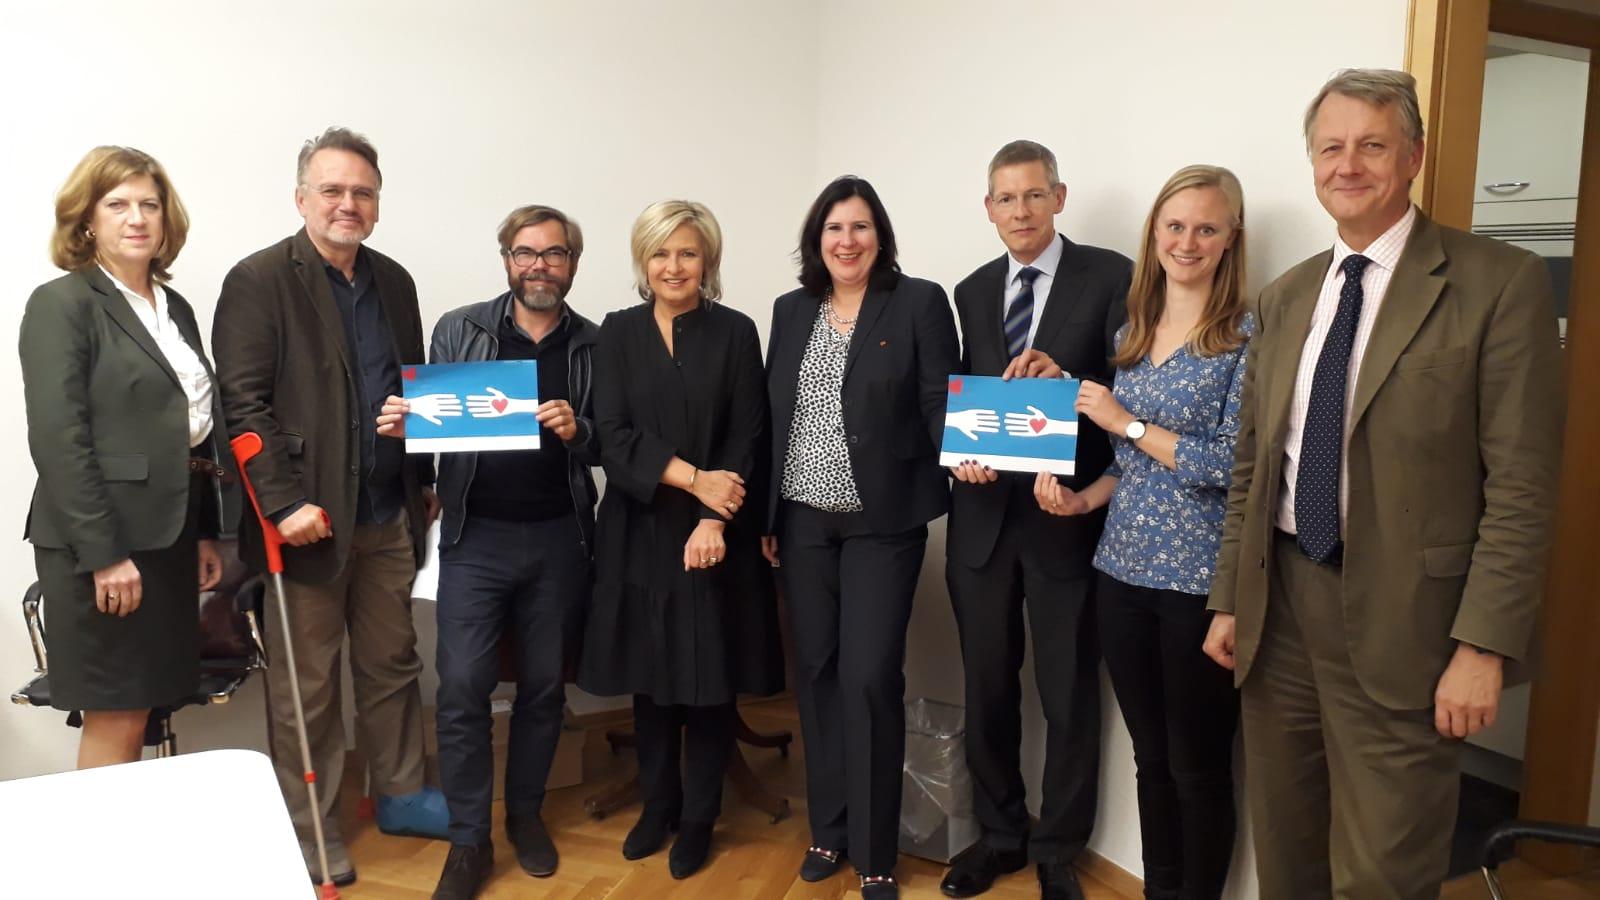 Vereinsgründung Leben Spenden e.V. - Bündnis für Organspenden